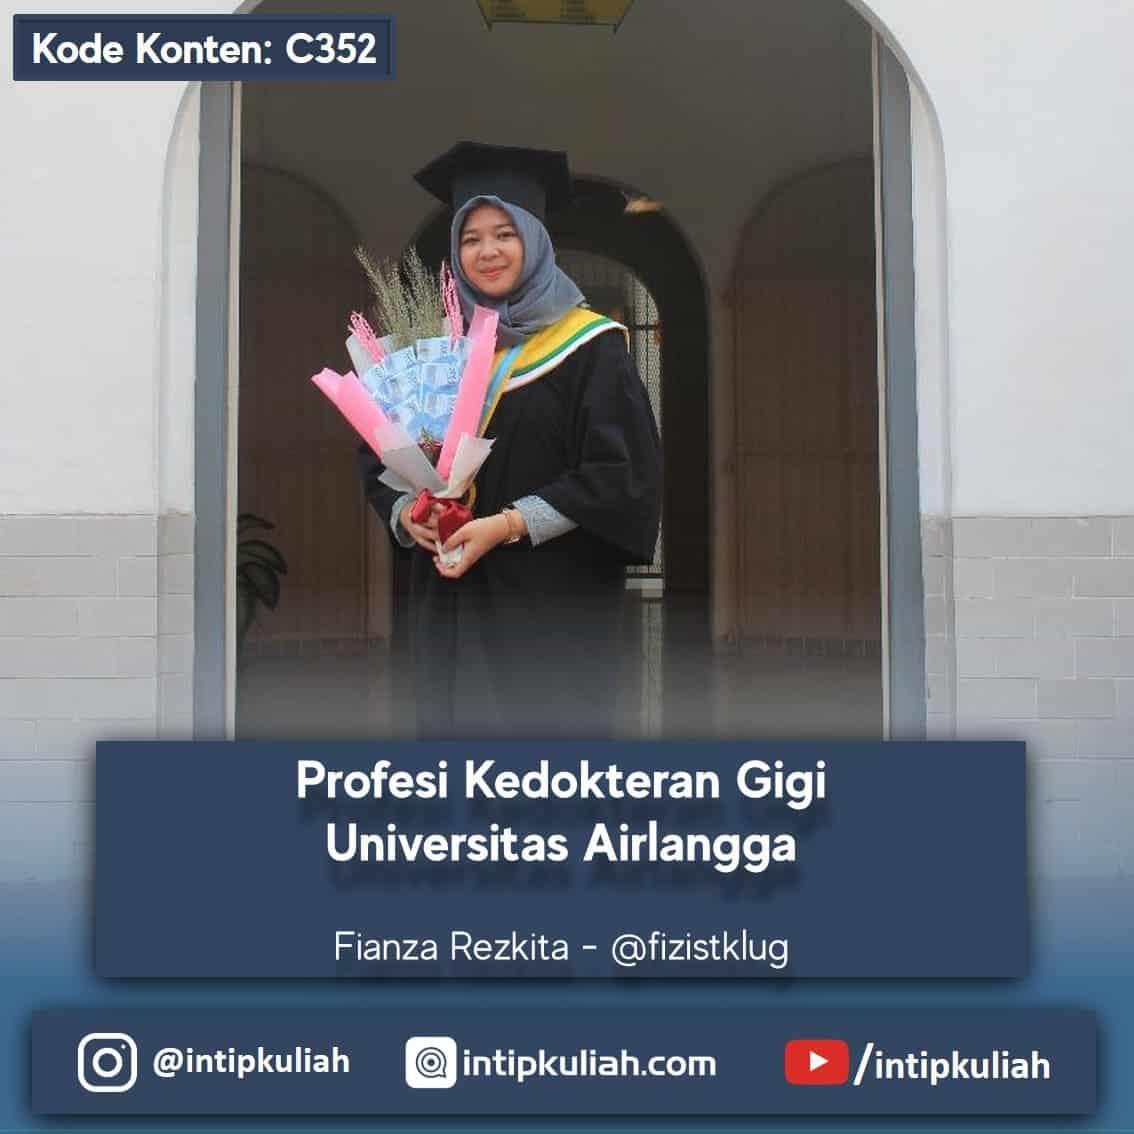 Mikrobiologi Institut Teknologi Bandung (Farizki)